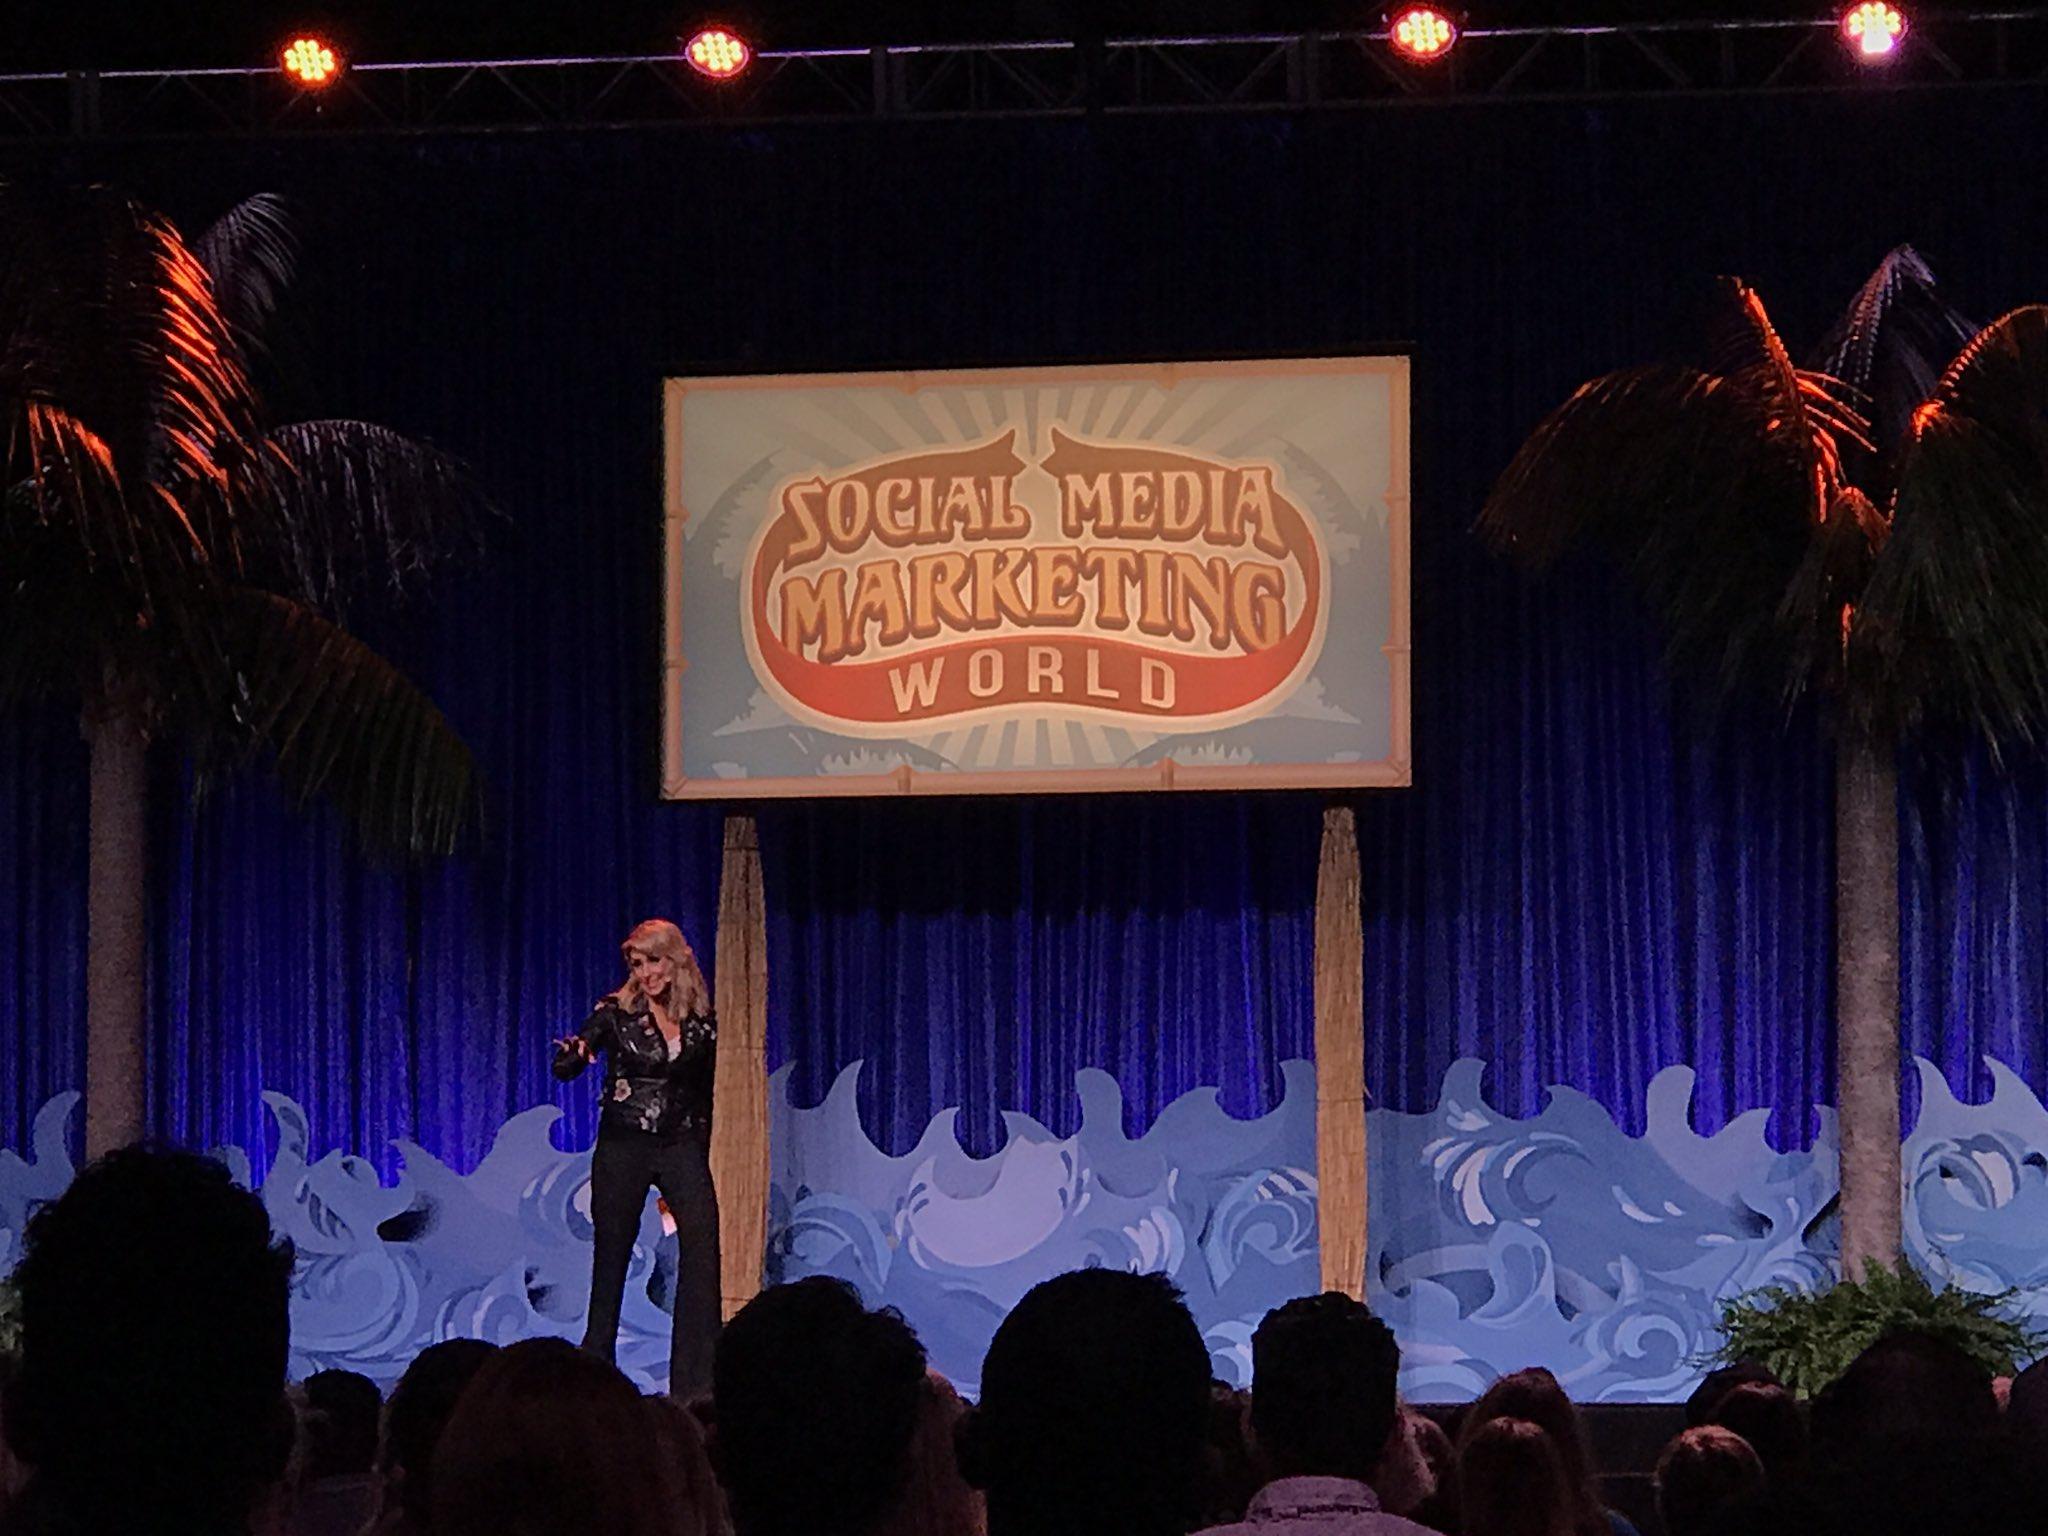 @ChaleneJohnson discussing infomercial strategy & live video #SMMW17 #beachbody #fitness #SocialMedia #marketing https://t.co/b4MdANz3ot